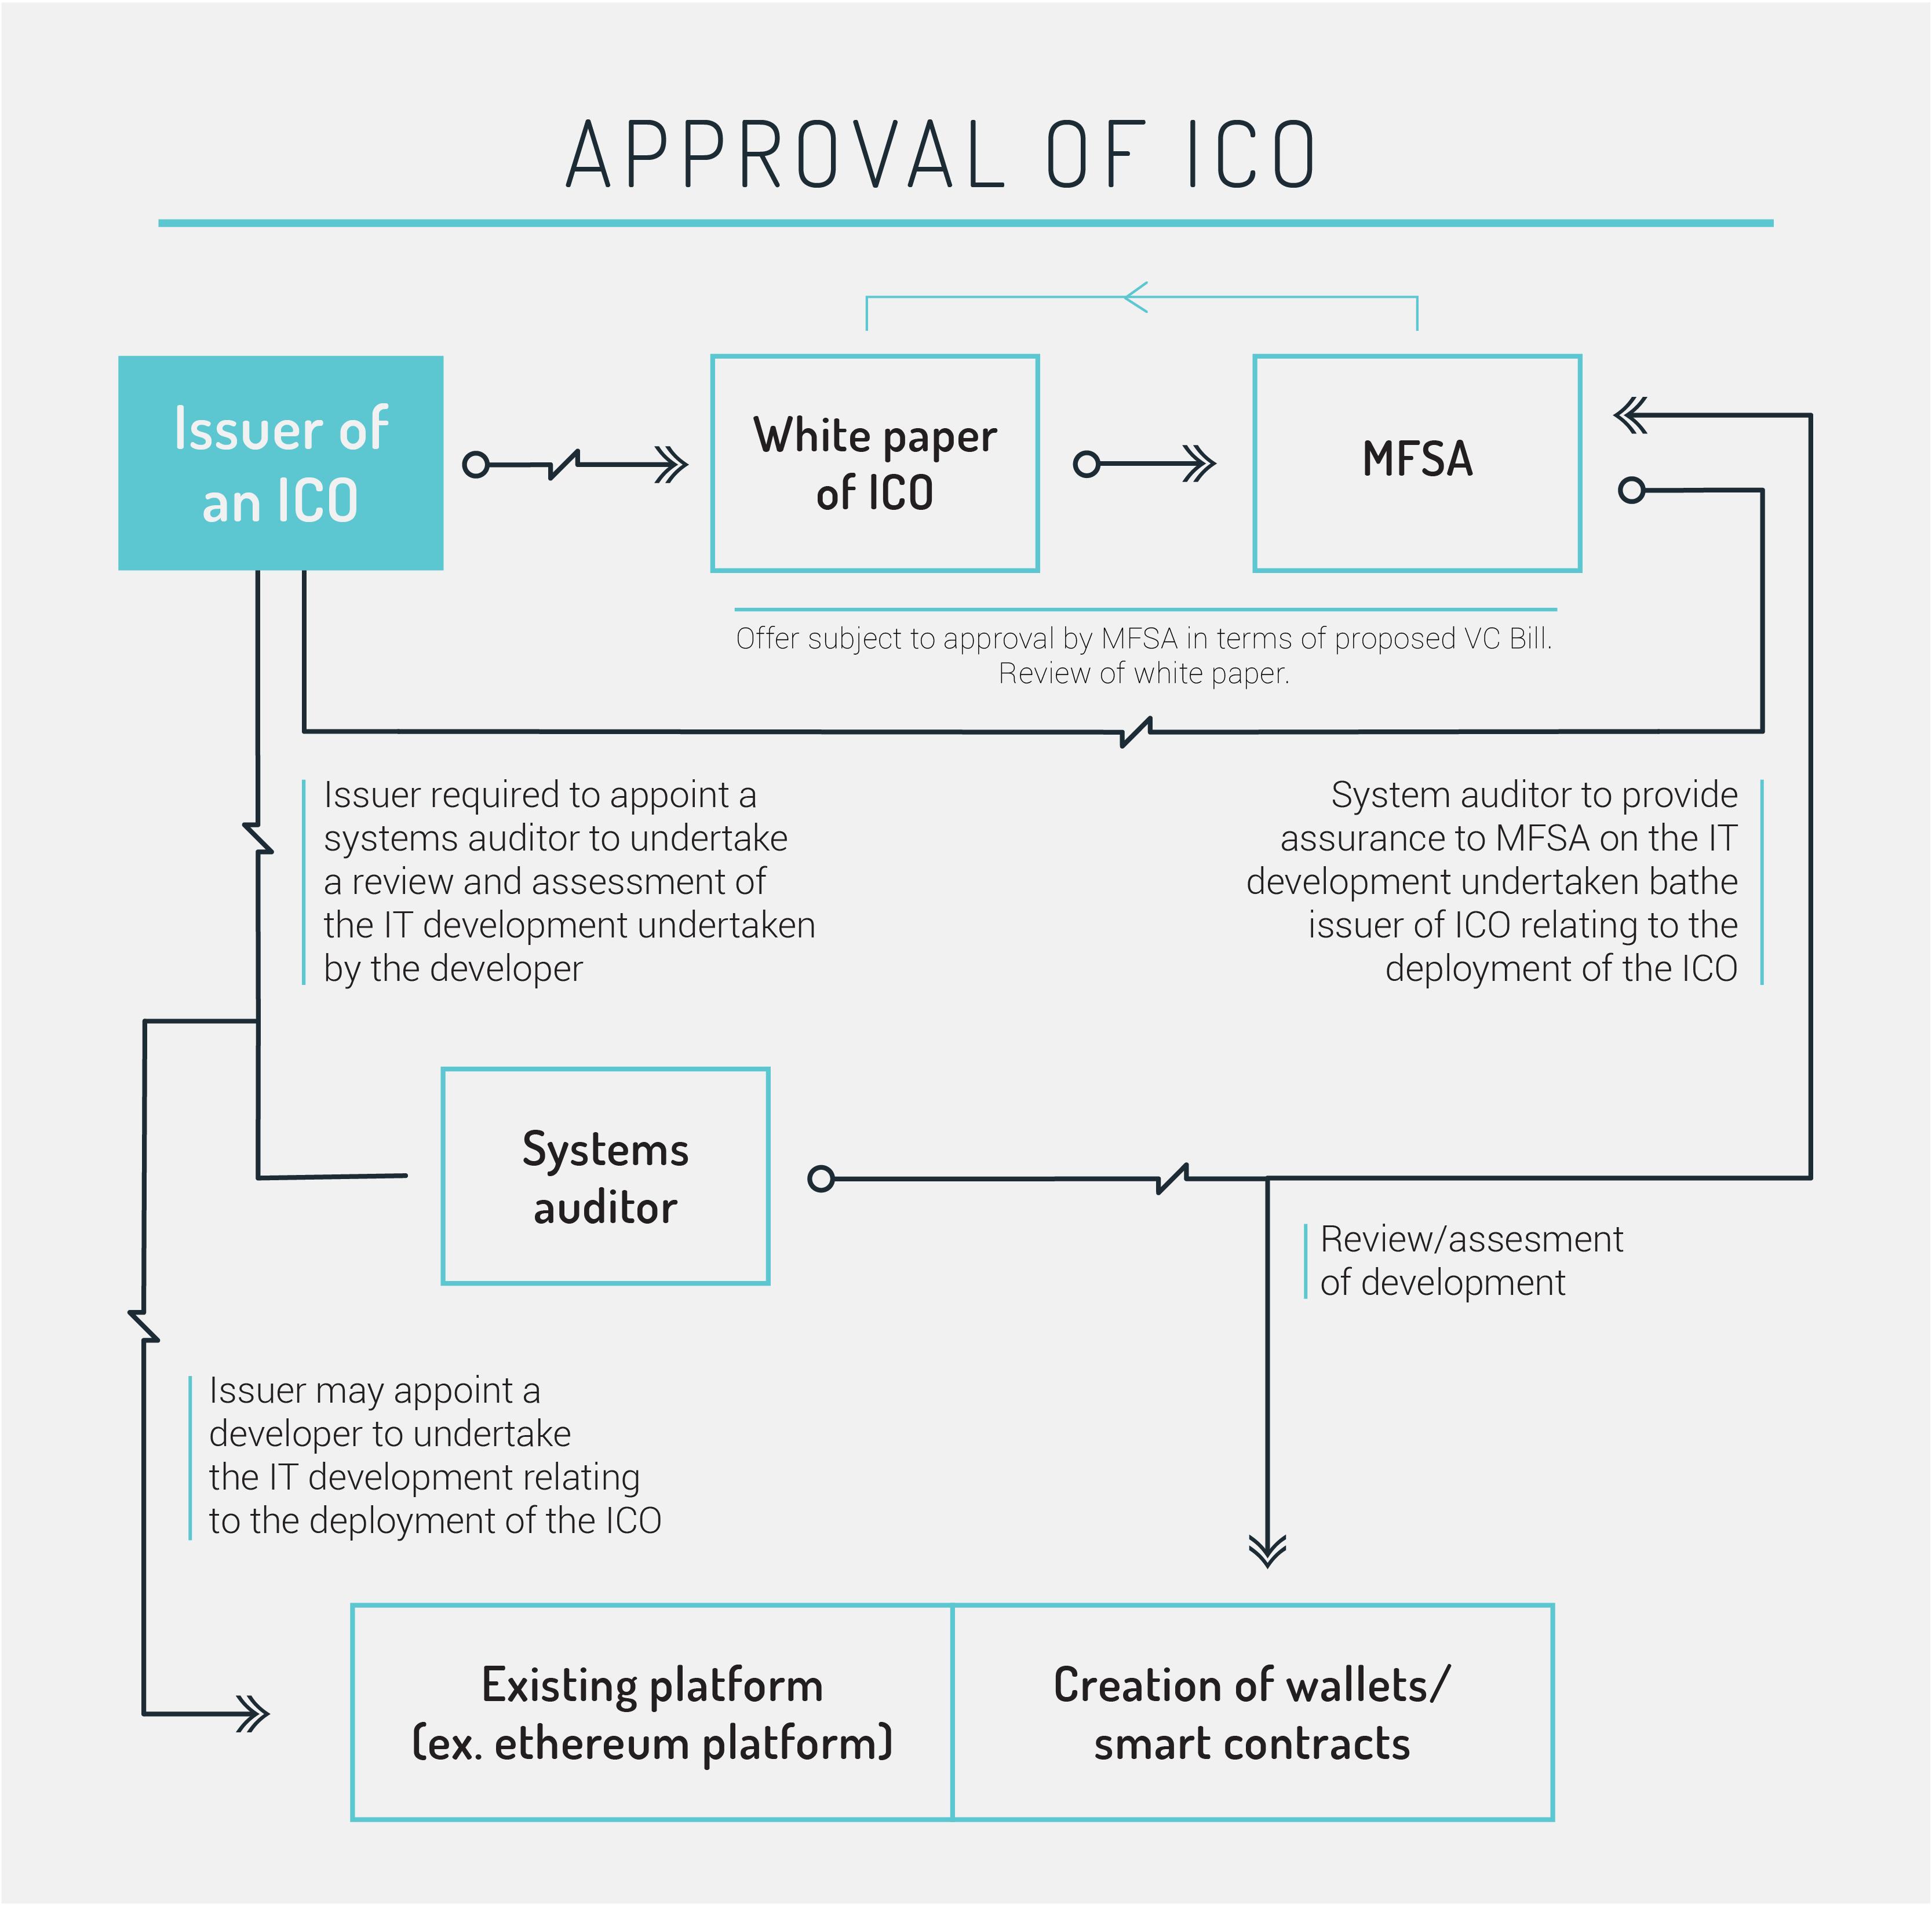 Malta ICO approval